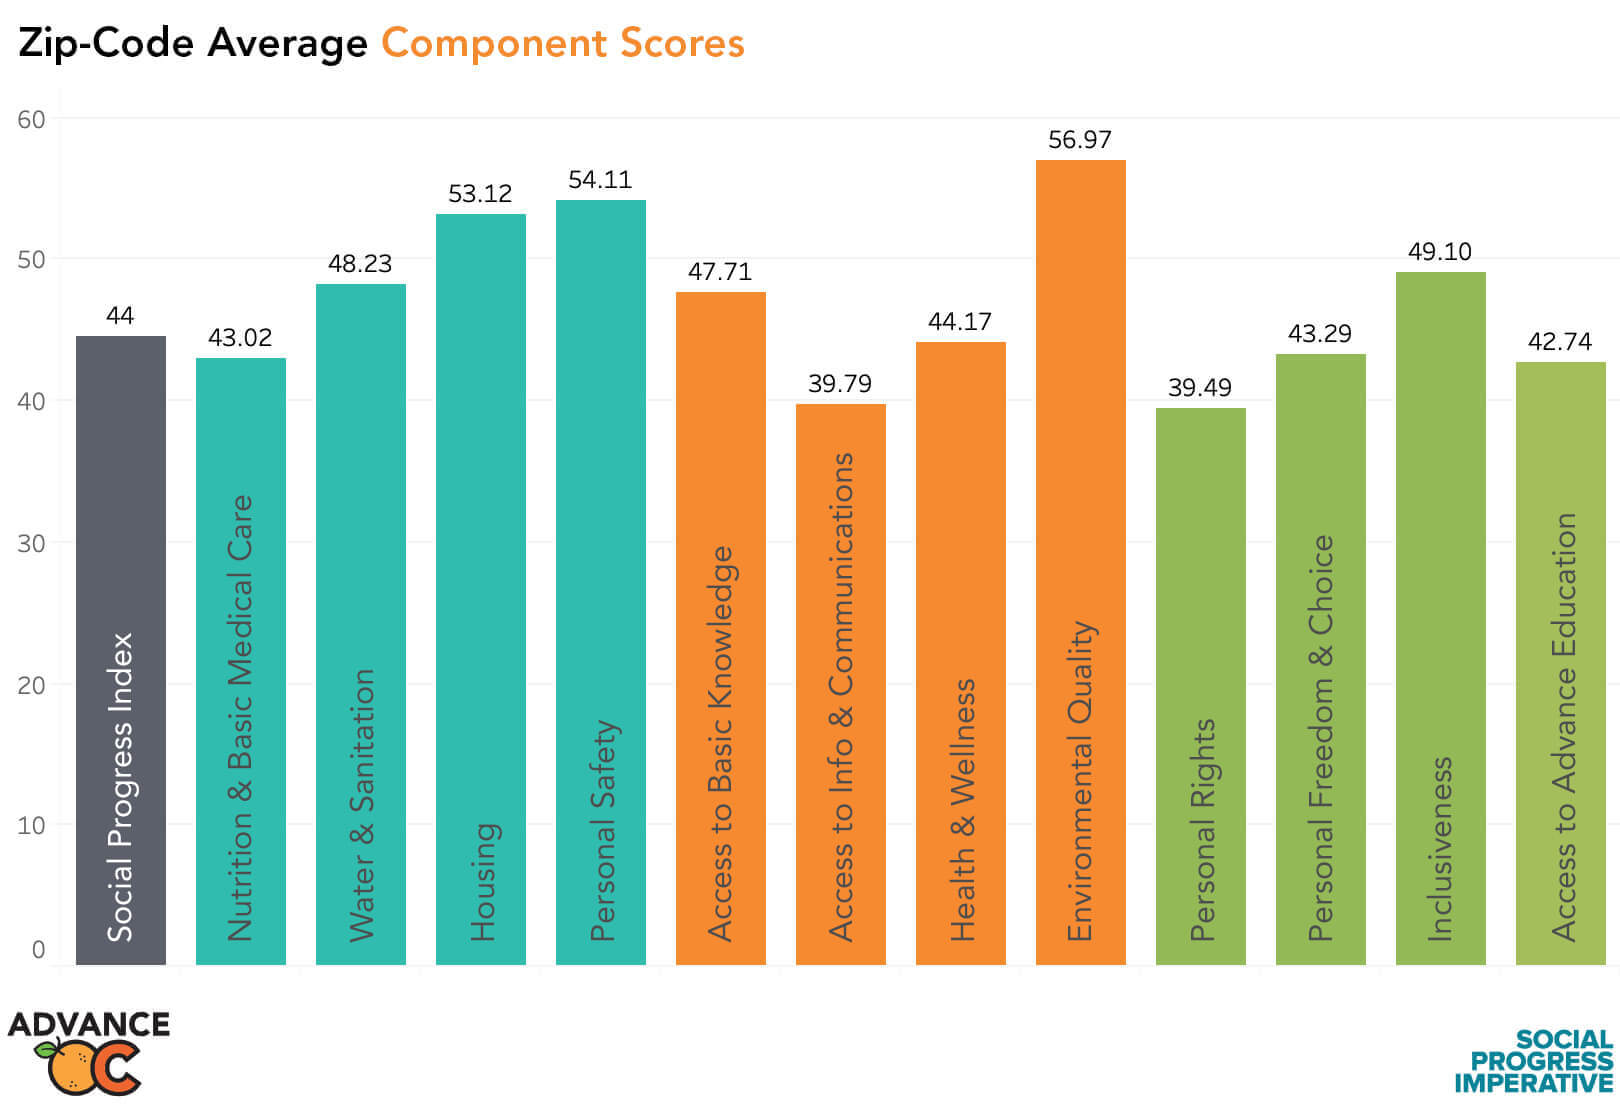 Zip-code Average Component Scores